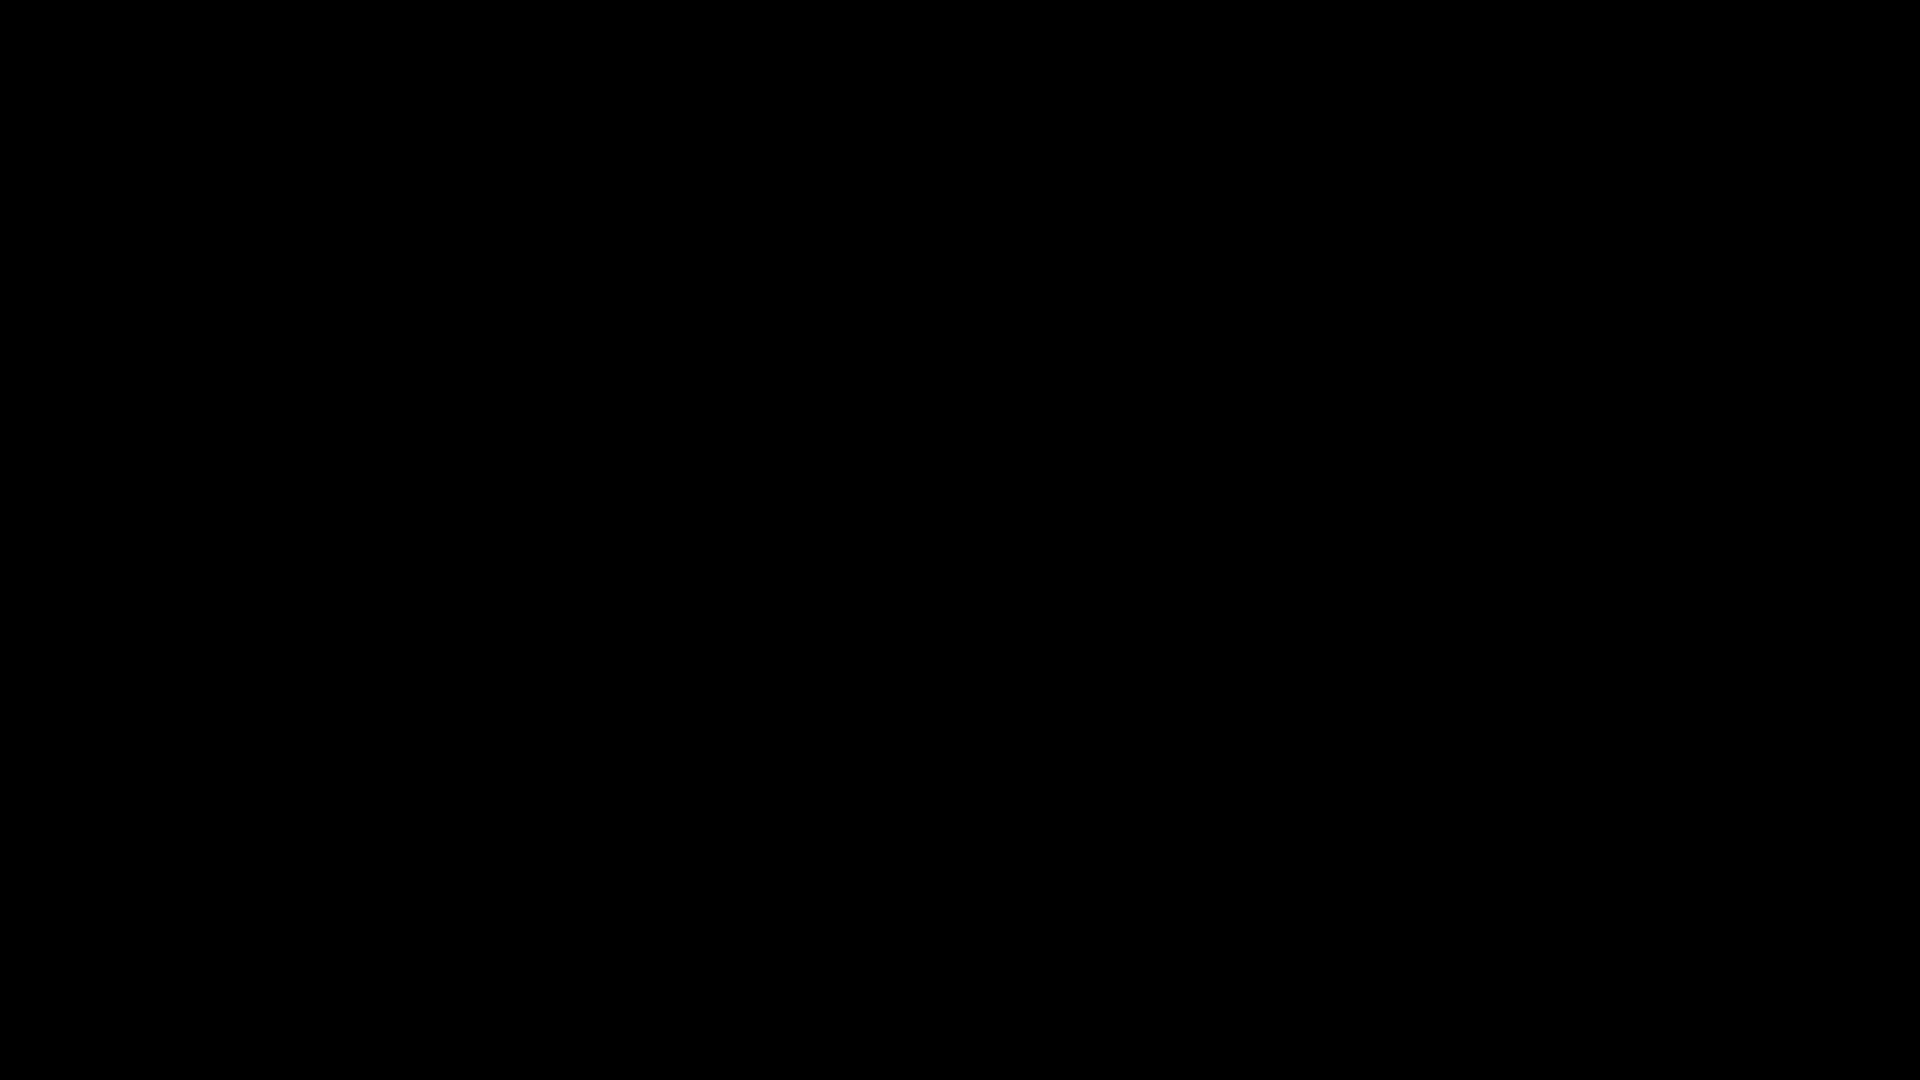 blizzard, dragon, expanison, hearthstone, mammoth, news, raven, trump, trumpsc, year, The Past, The Present & The Future of Mammoth Shaman/Warlock & Warrior Cards! | Hearthstone Rotation GIFs